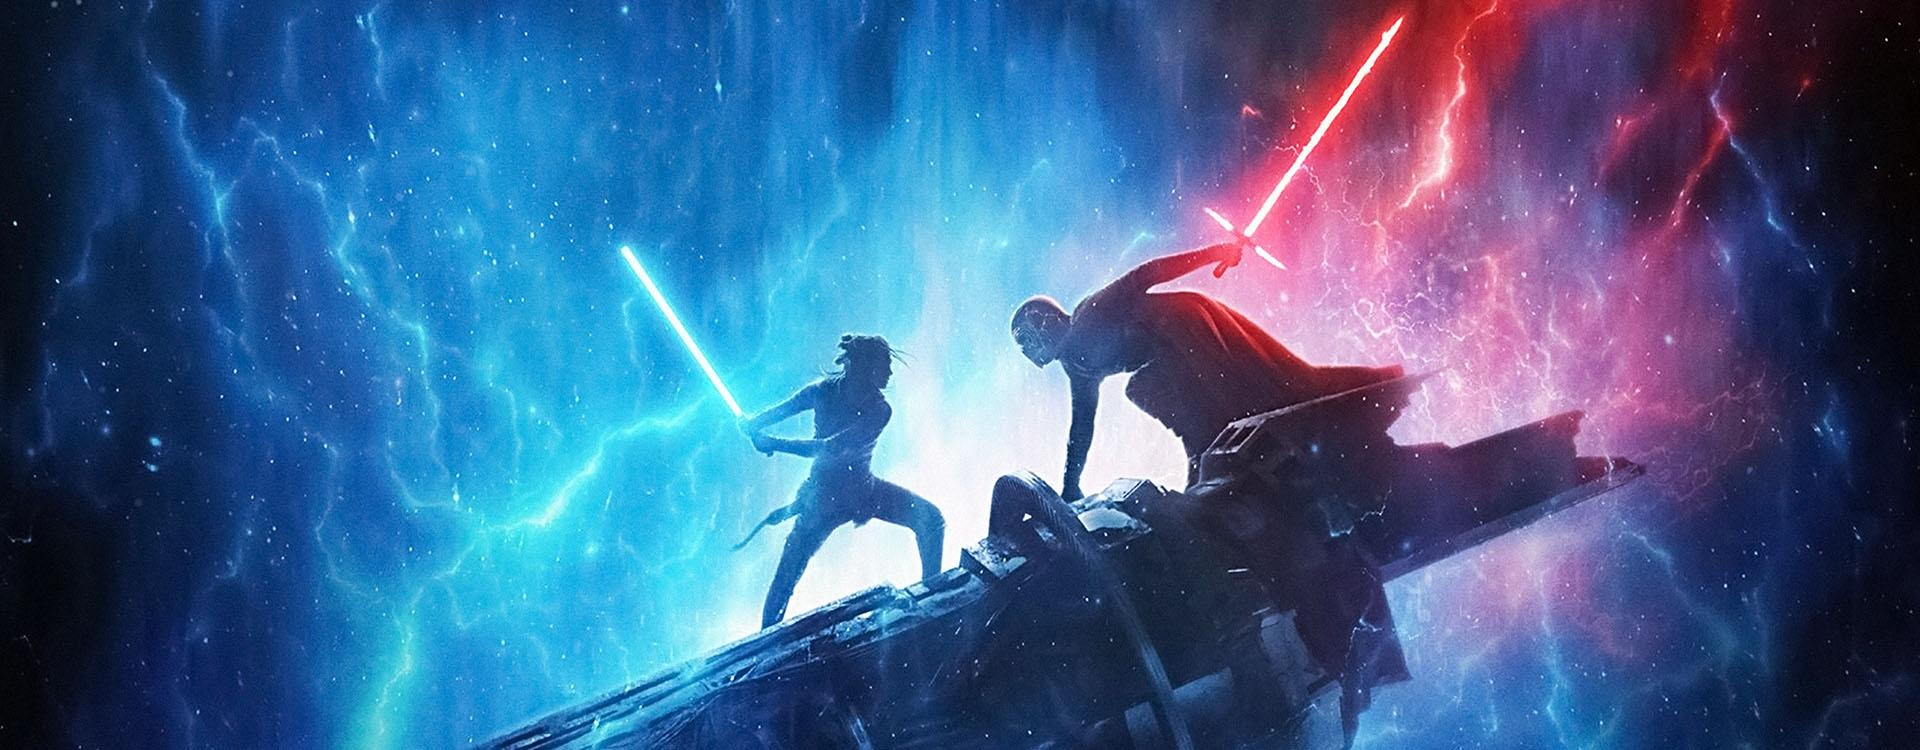 La recensione di Star Wars: L'ascesa di Skywalker